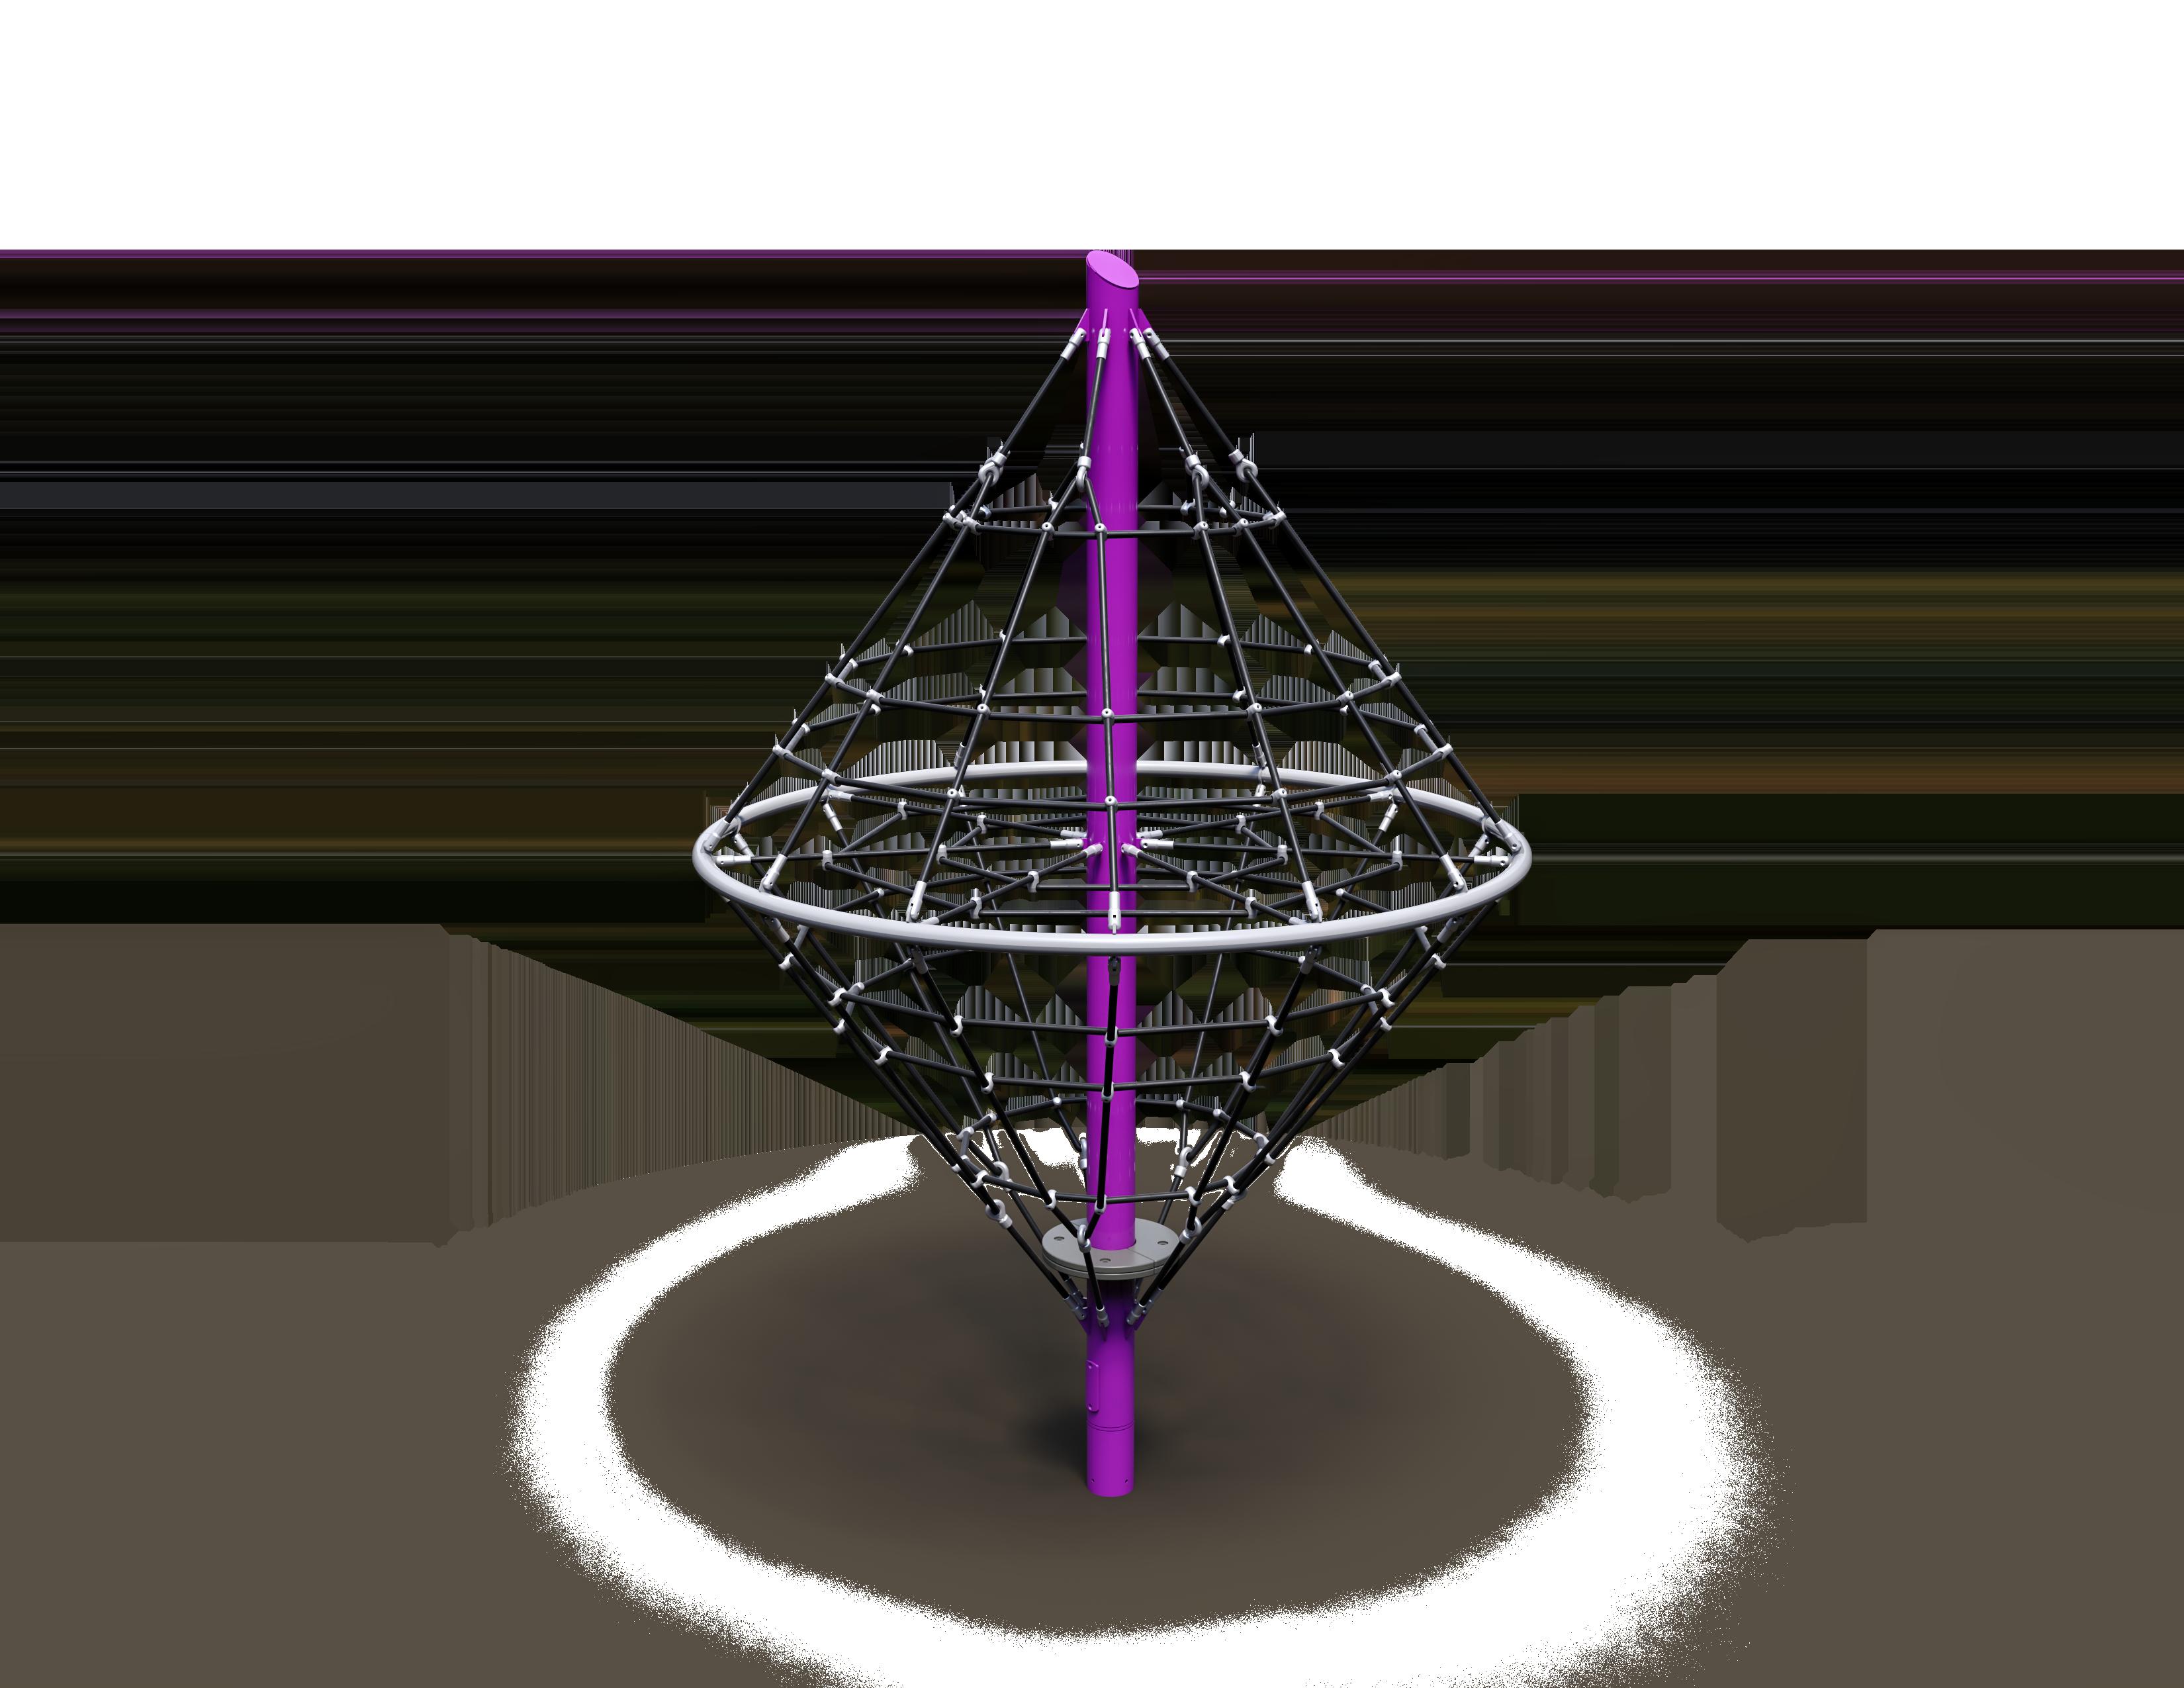 Cyclo Diamond Spinner